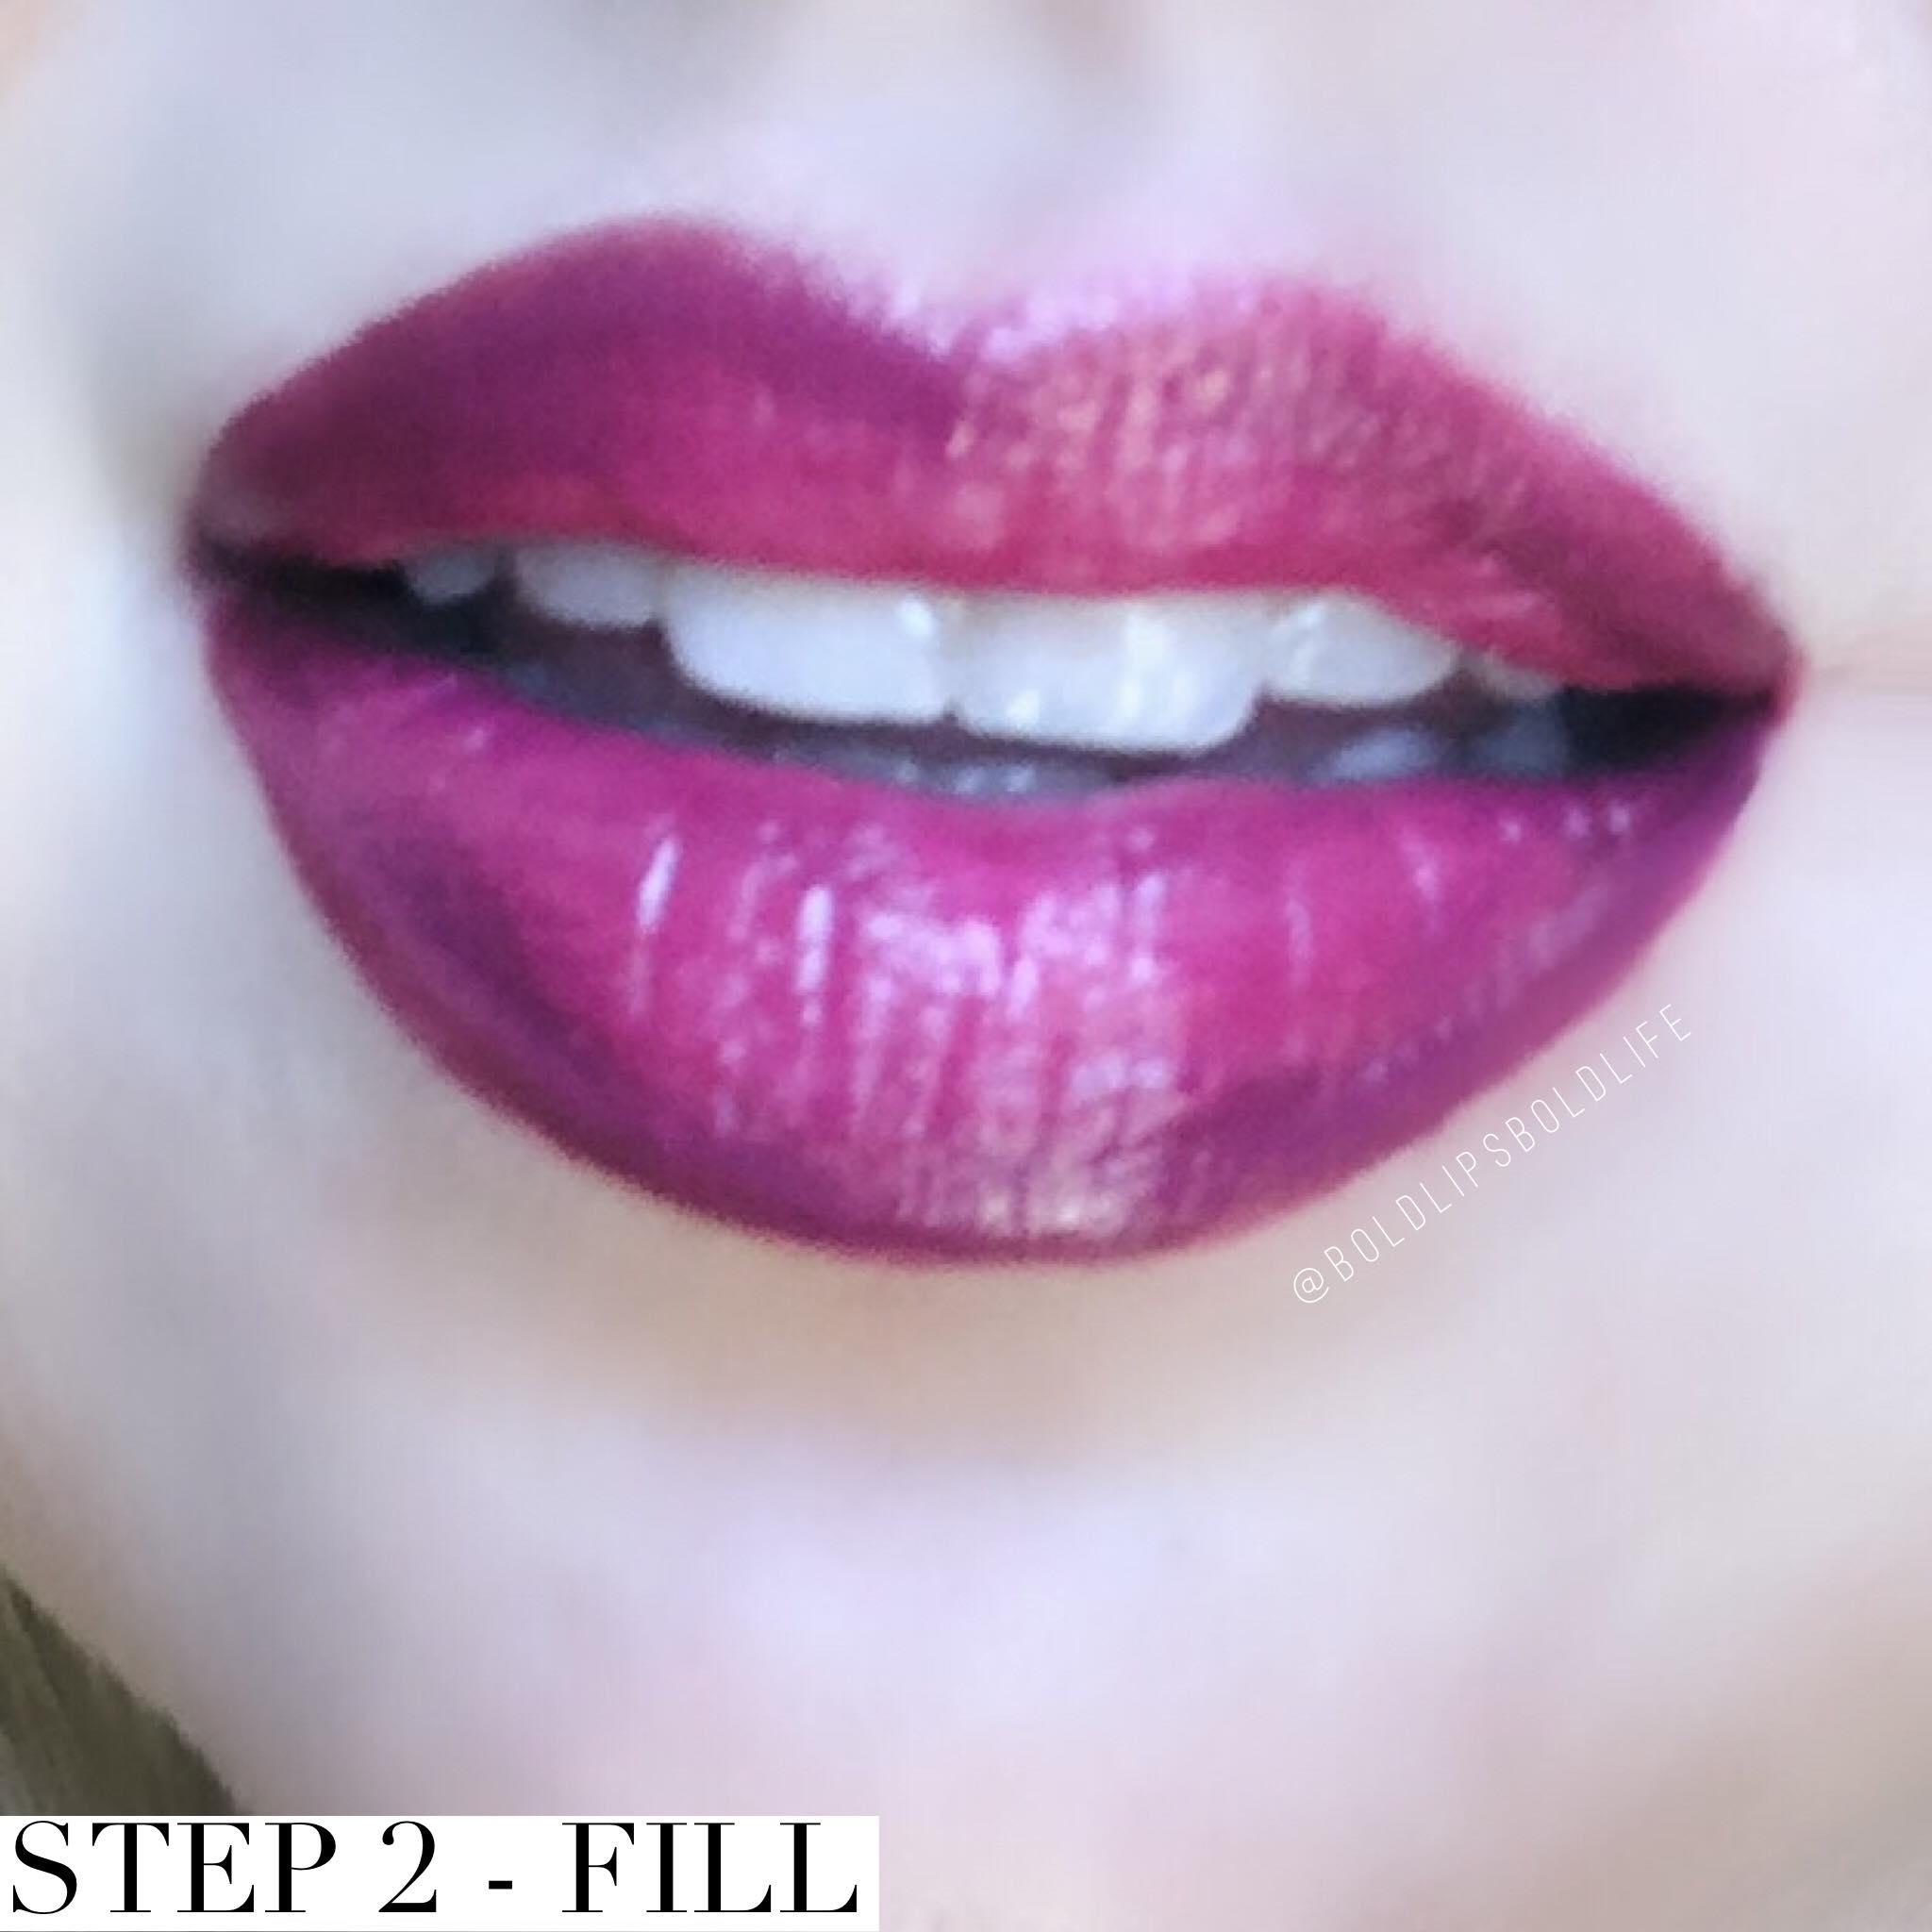 LipSense Ombré Lips - Ombre Lipstick